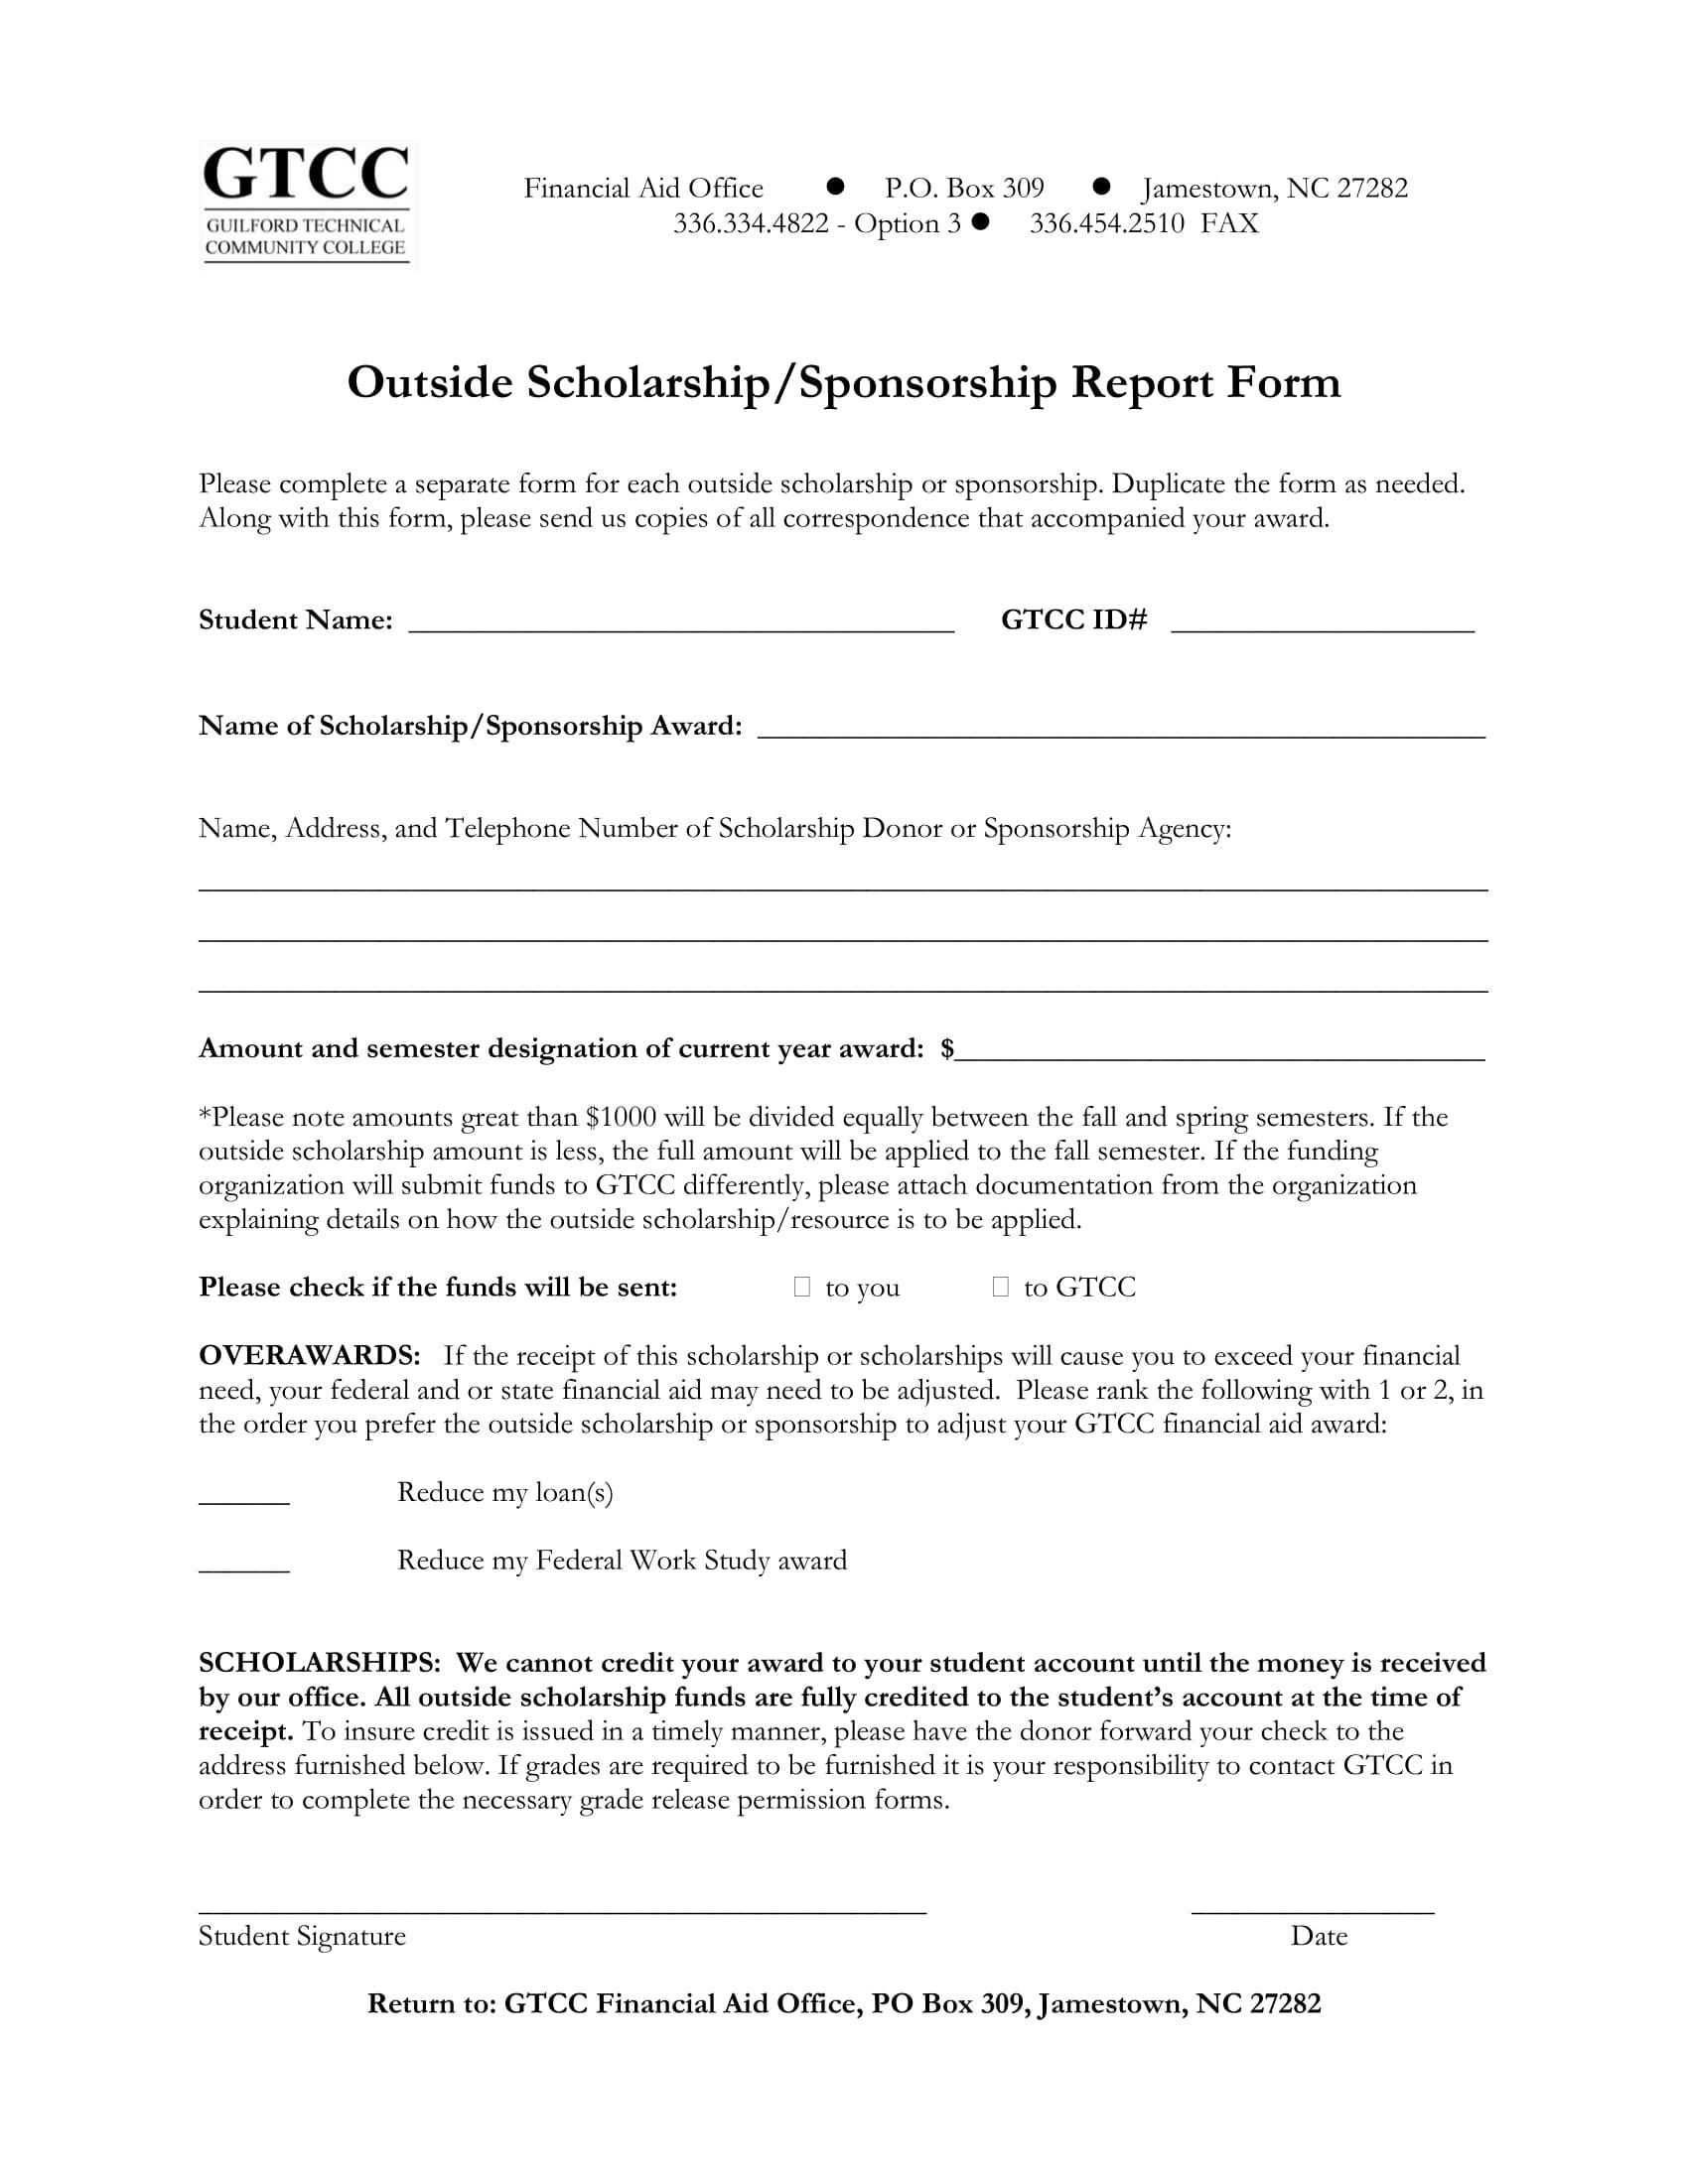 scholarship or sponsorship report form 1